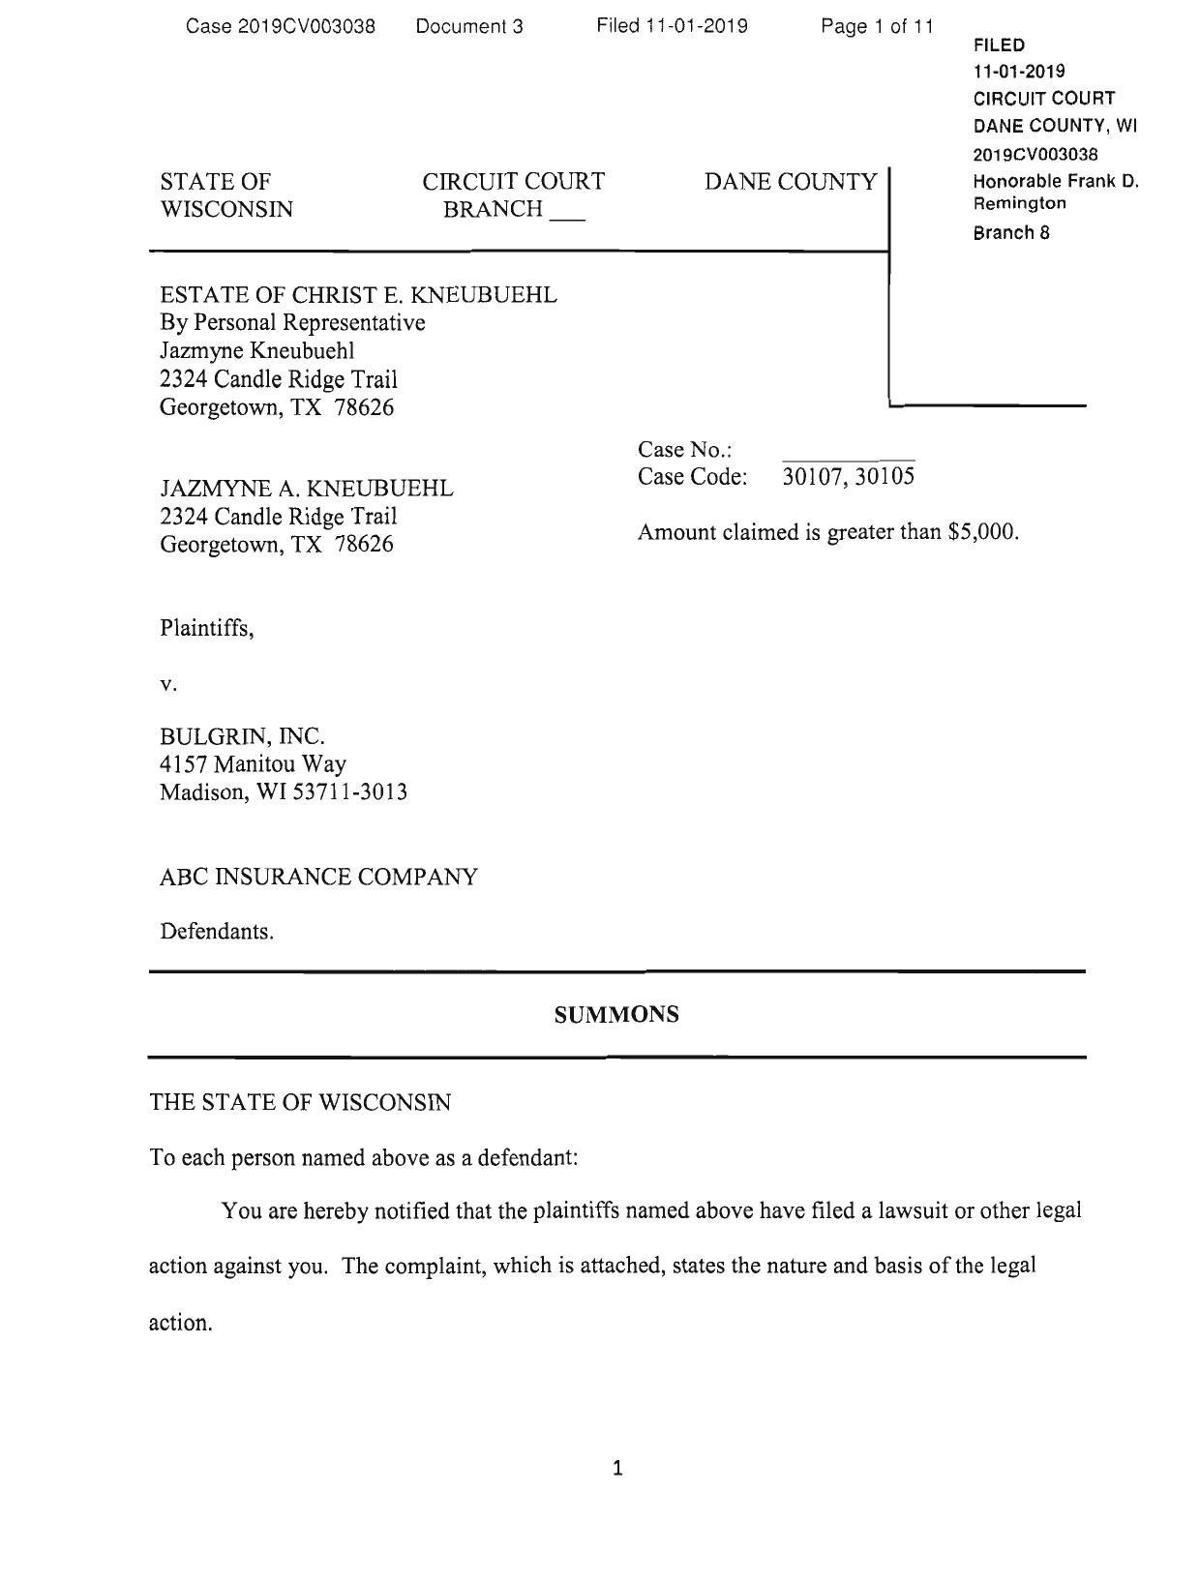 Culver's lawsuit